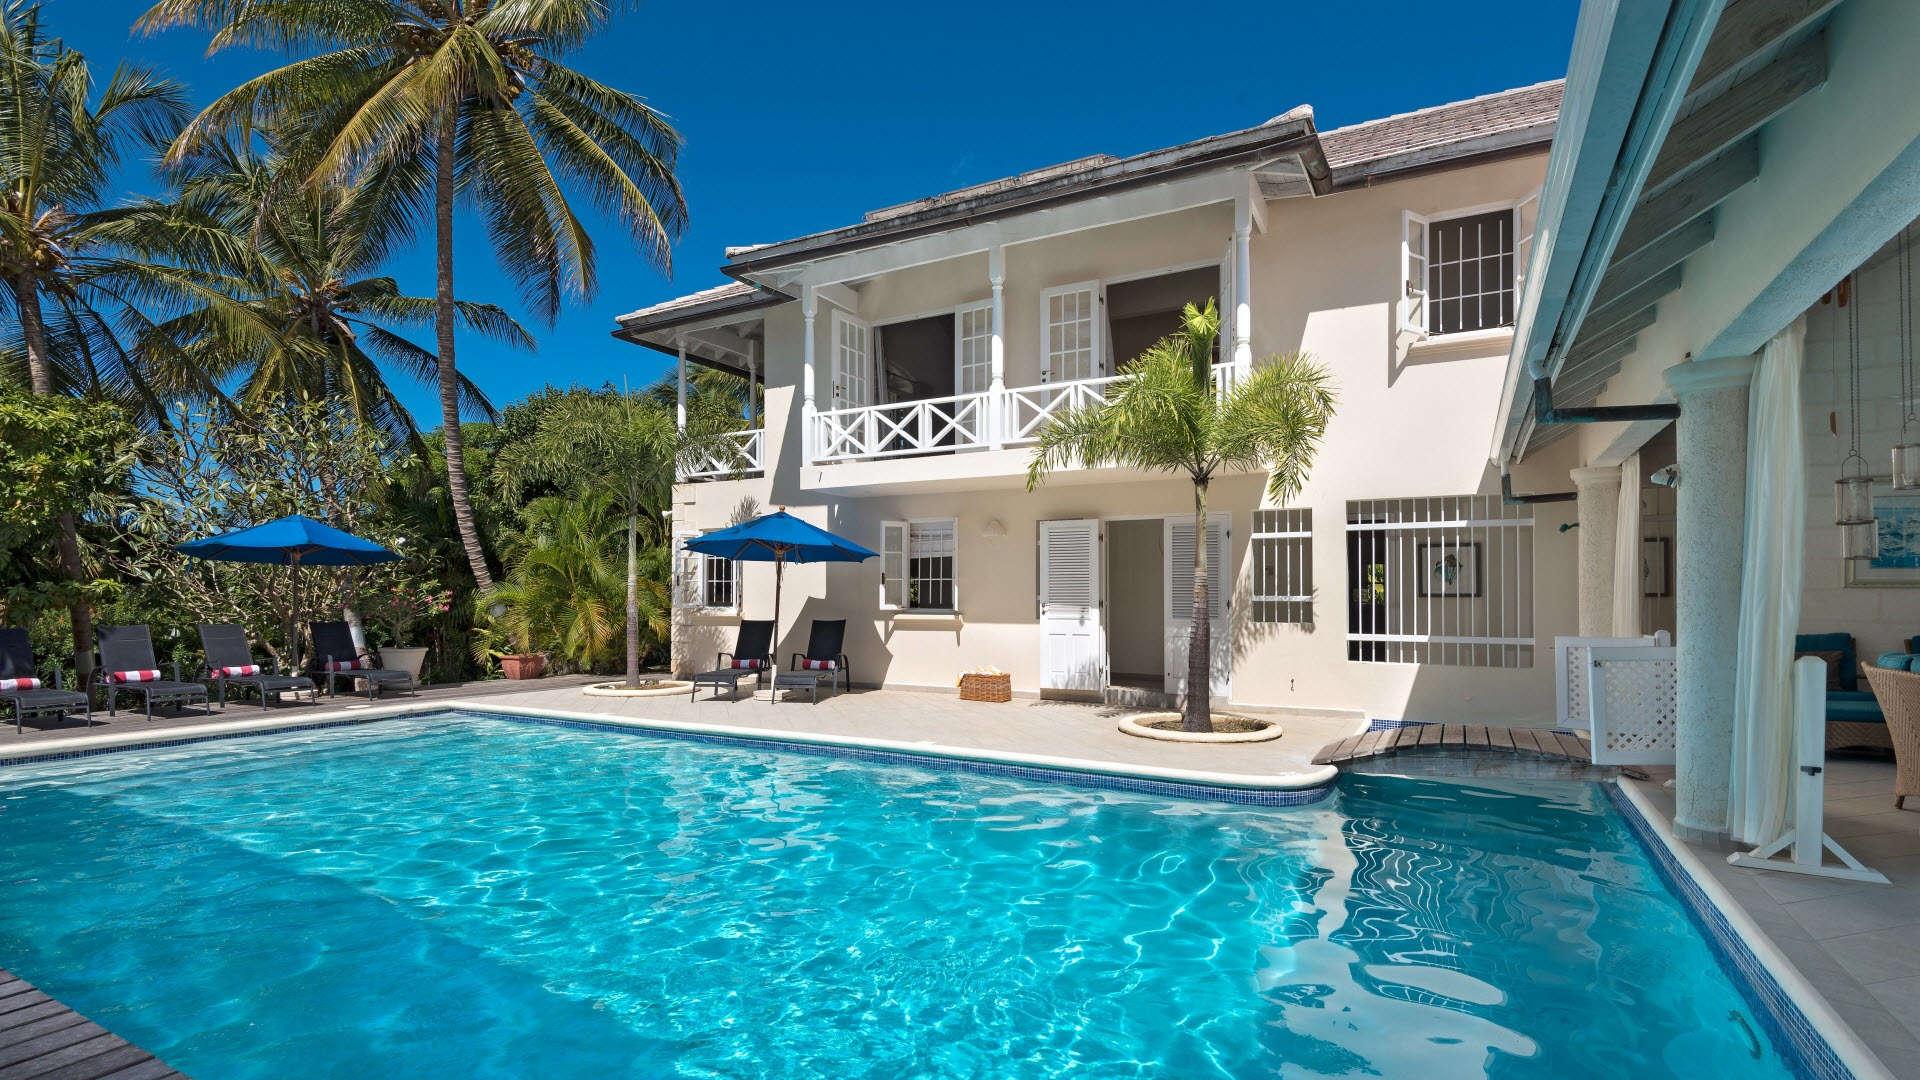 Luxury villa rentals caribbean - Barbados - St james - Sandy lane - Ca Limbo - Image 1/8